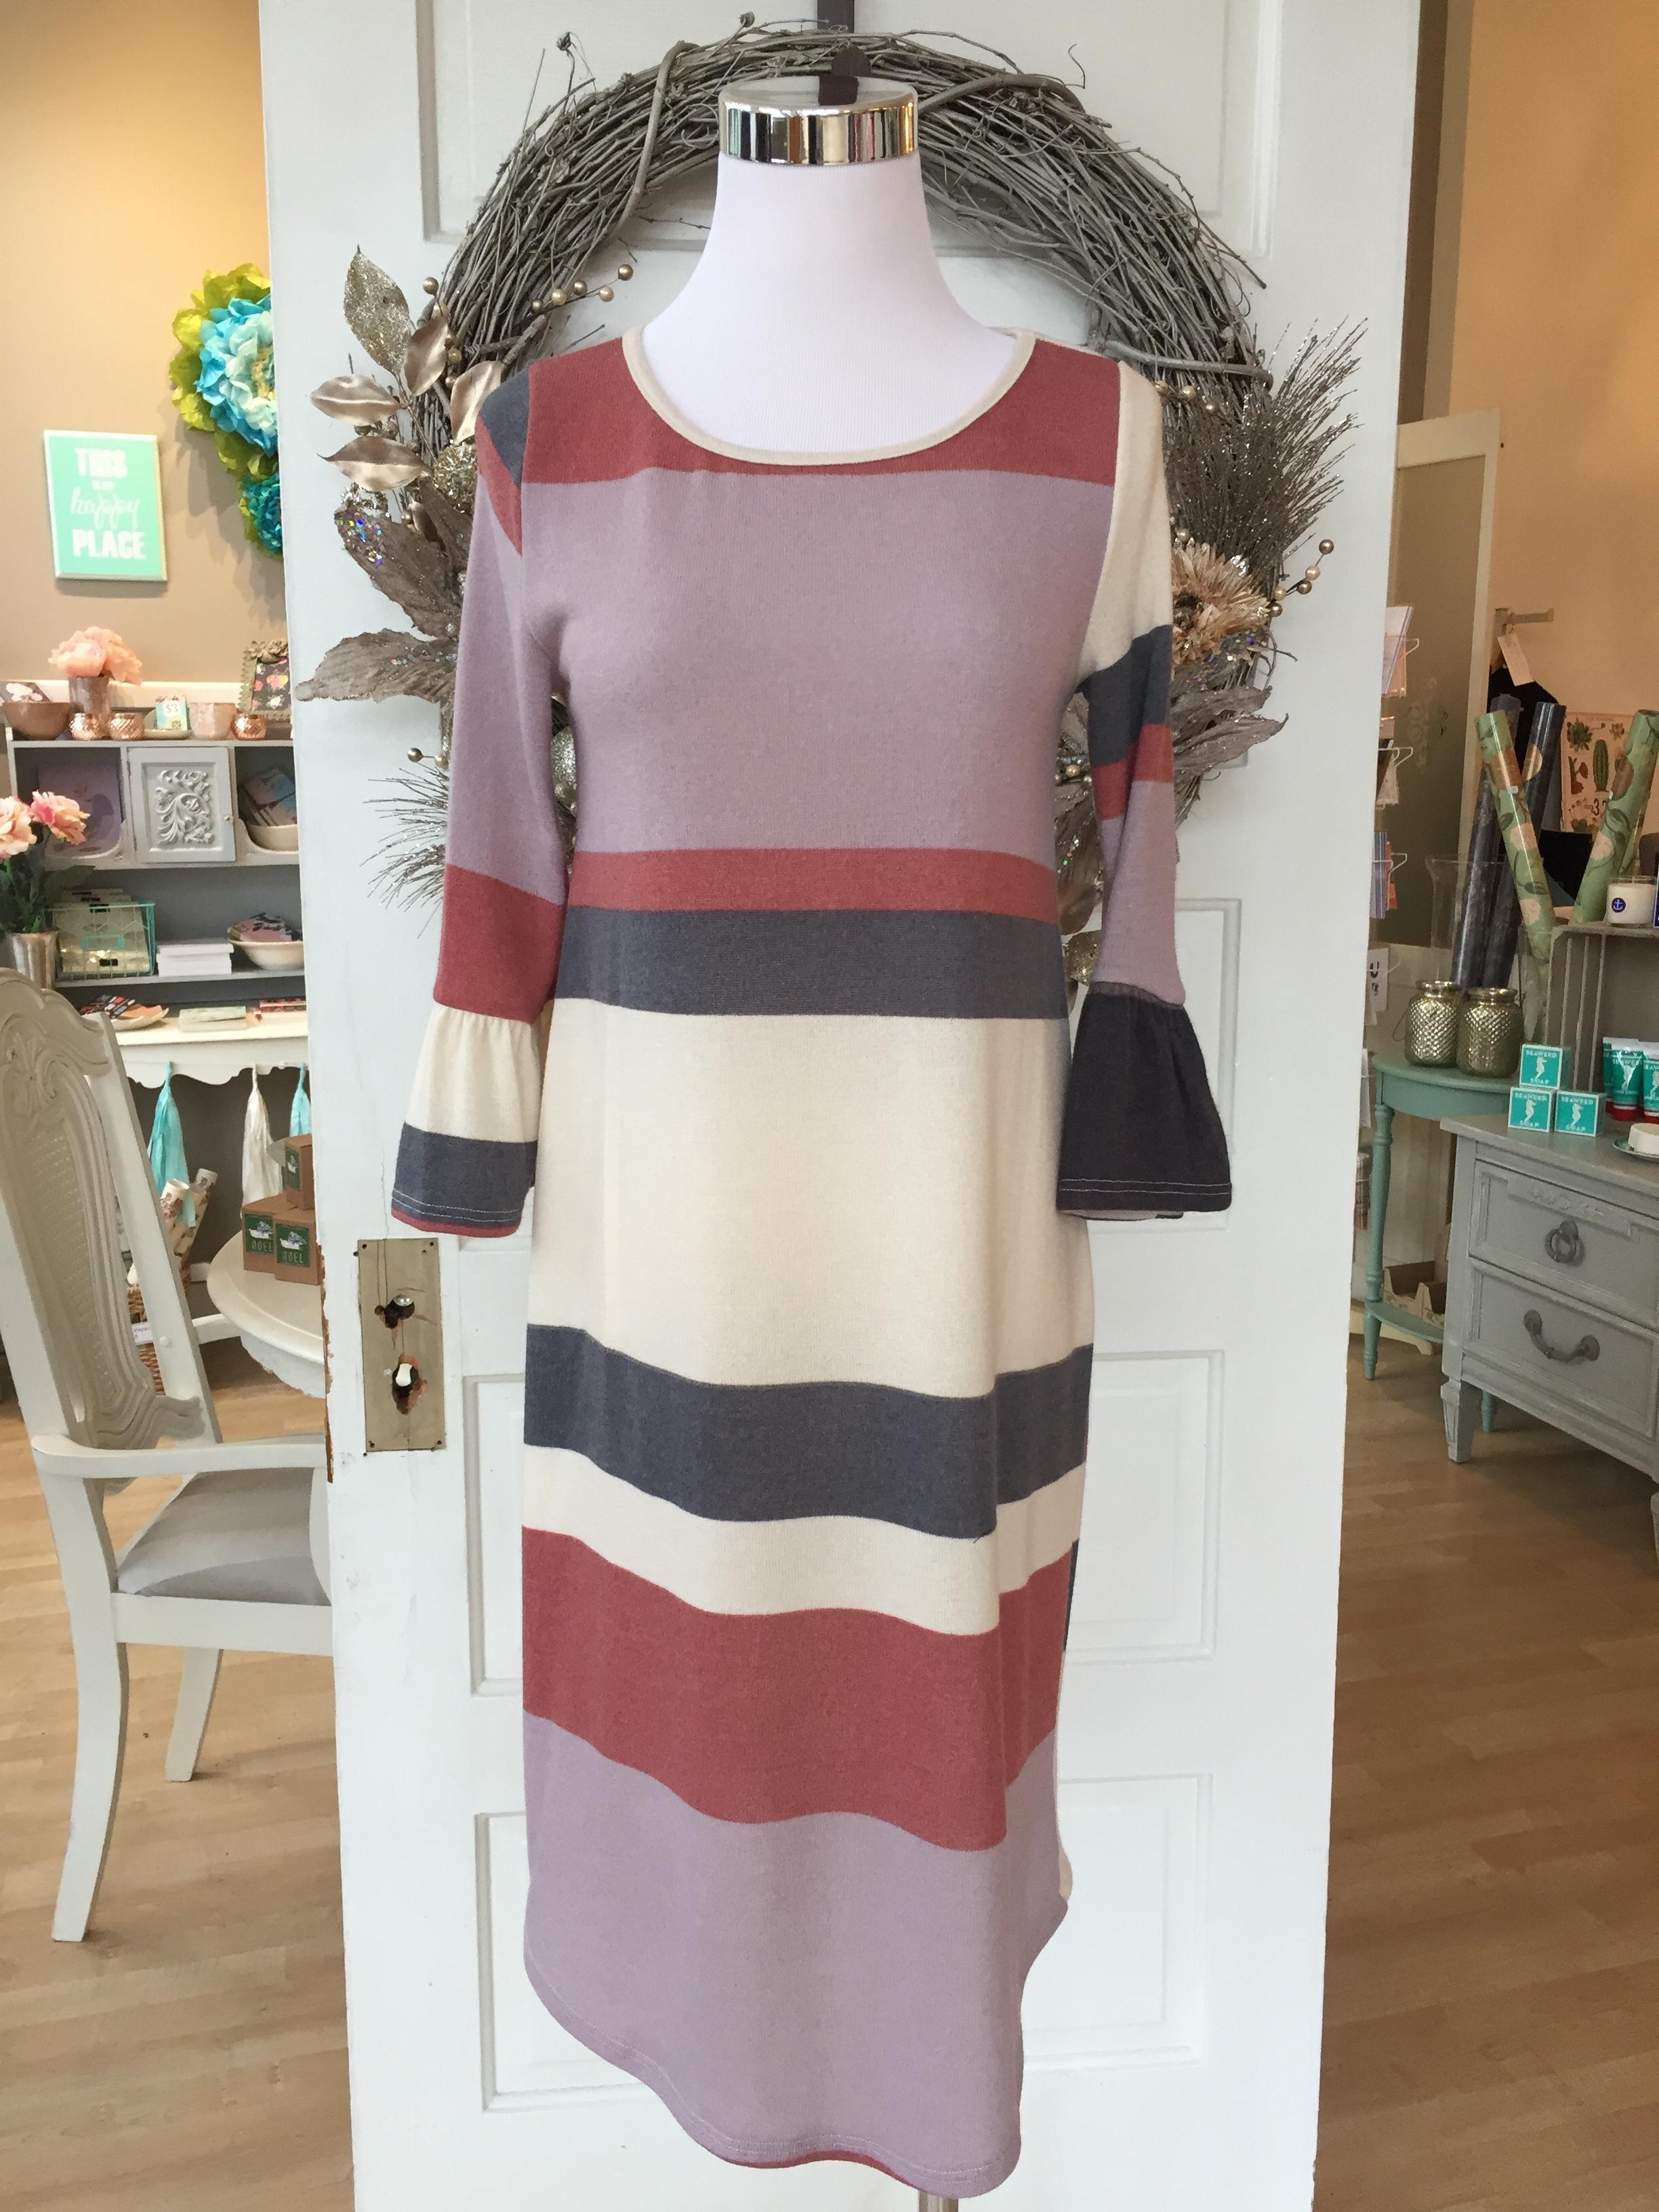 Les Amis Striped Dress $38